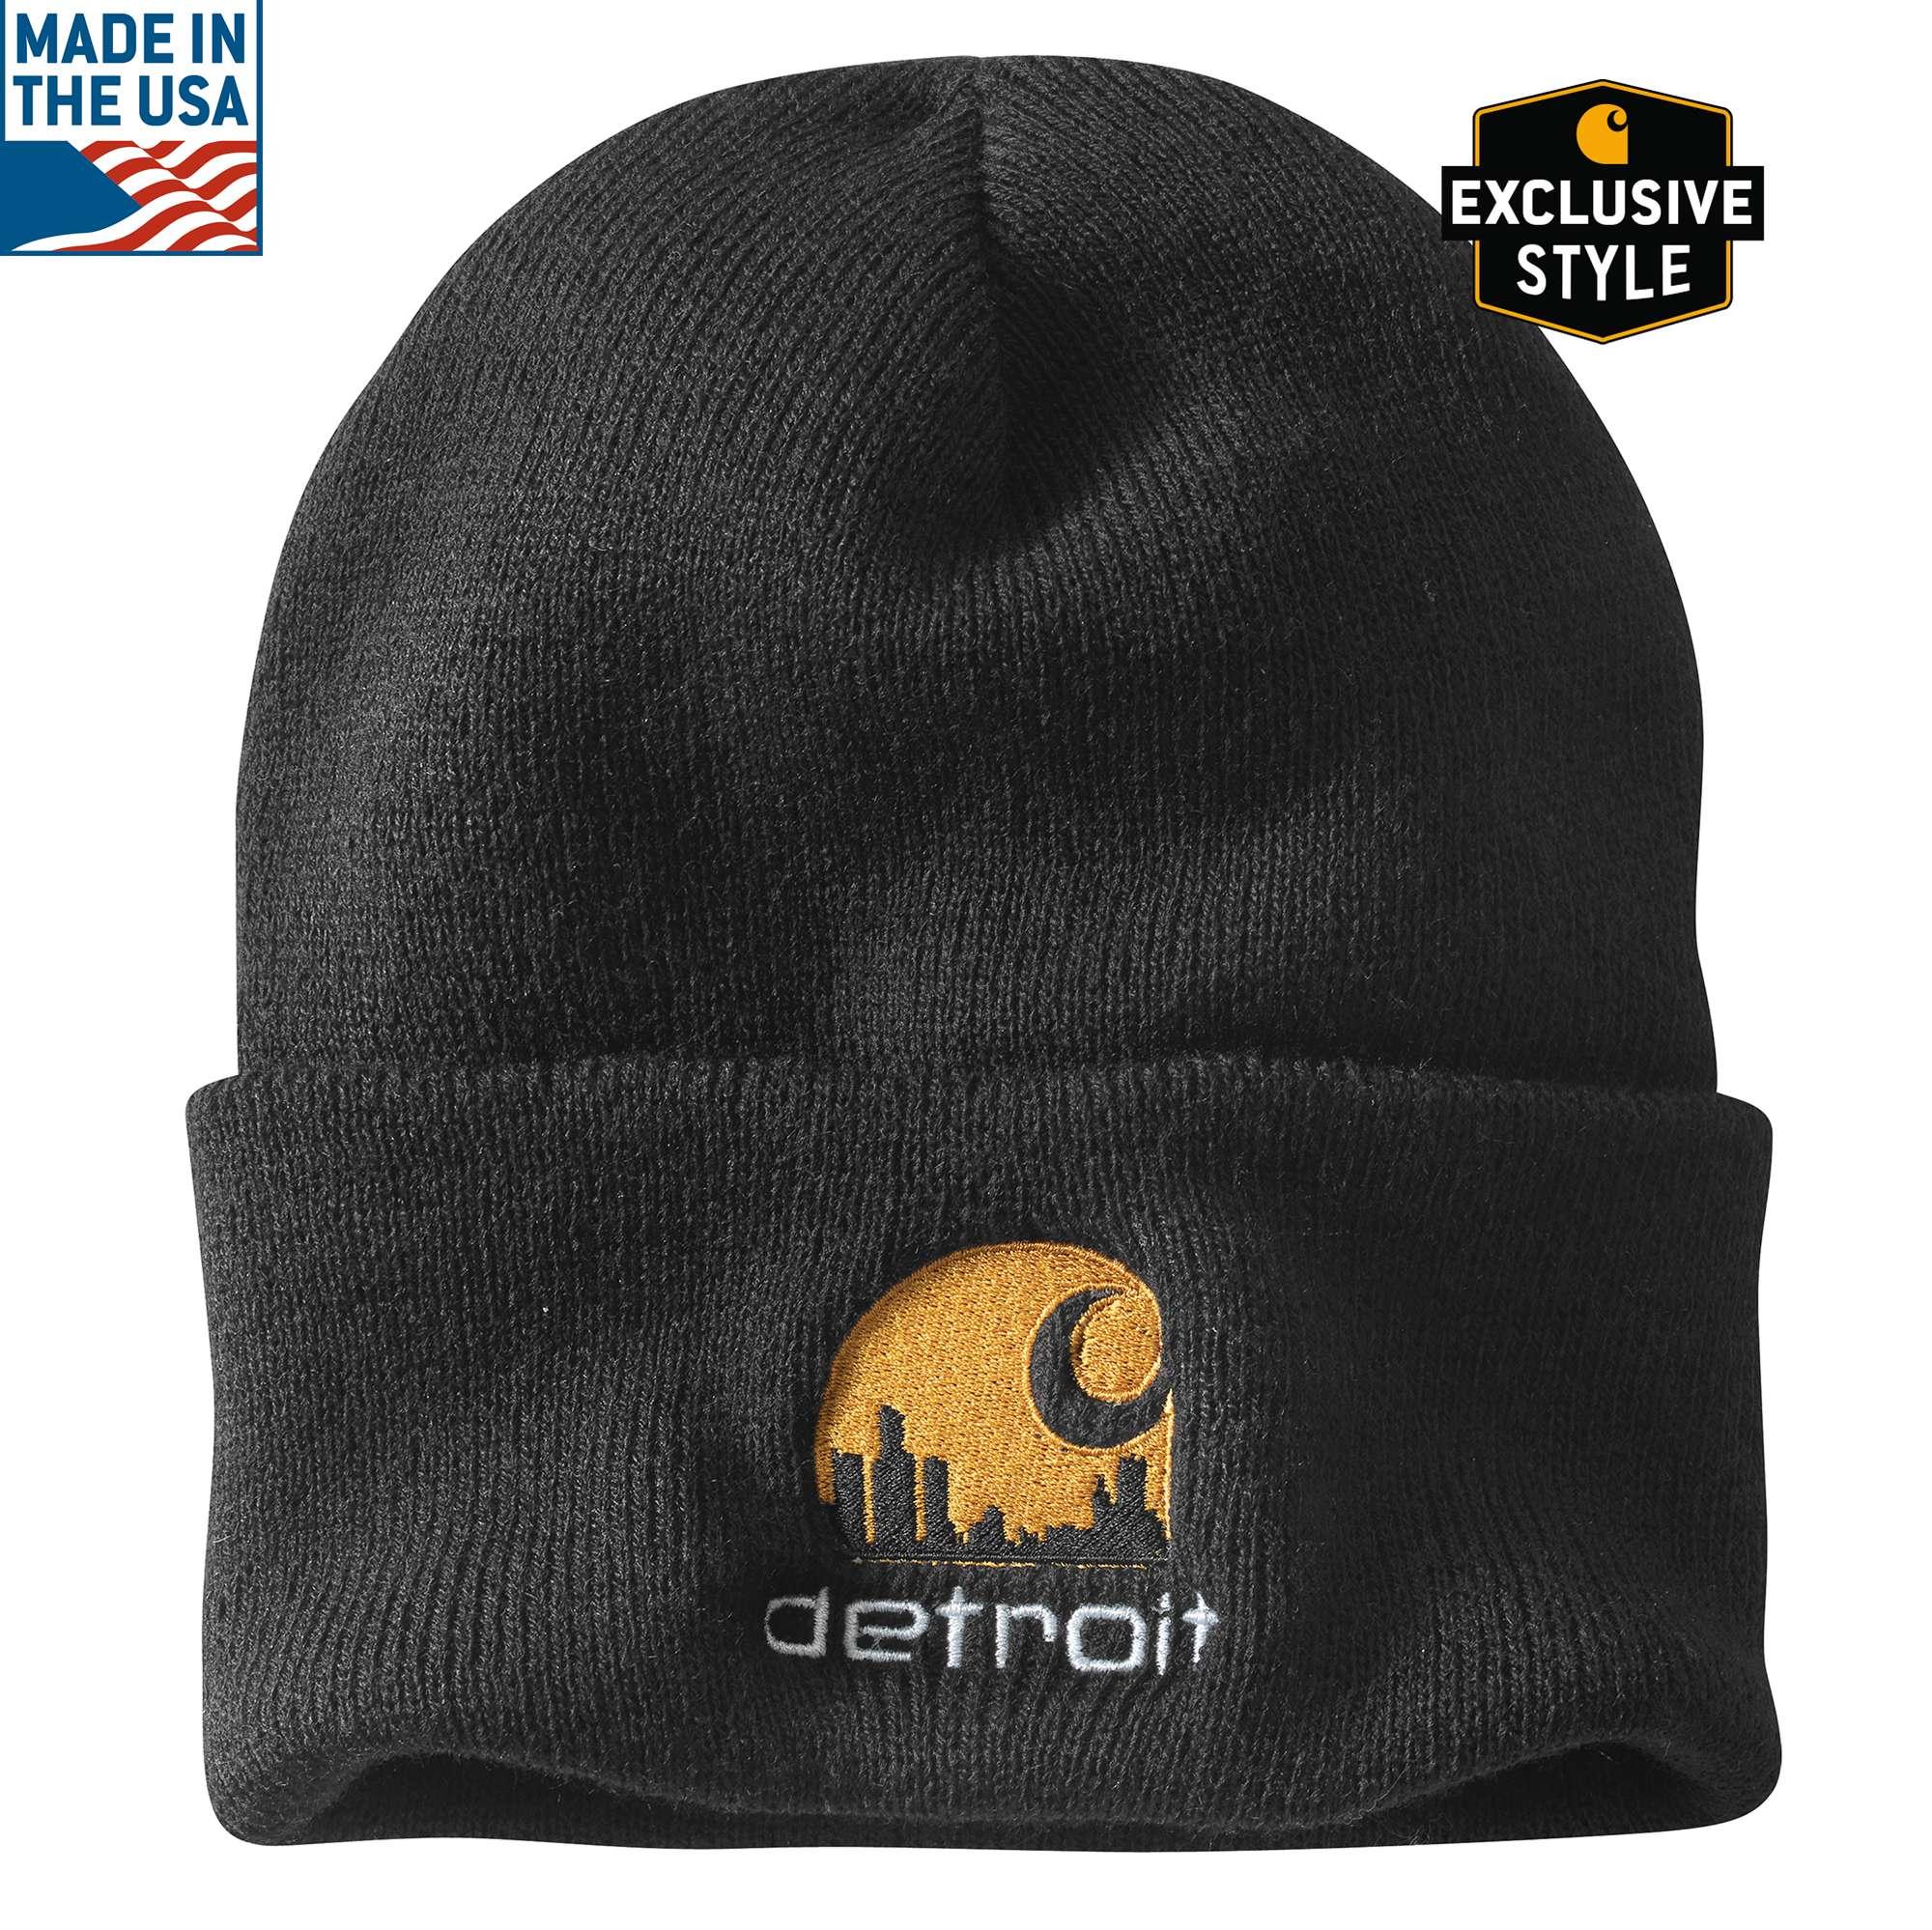 Carhartt Special Edition Detroit Acrylic Watch Hat